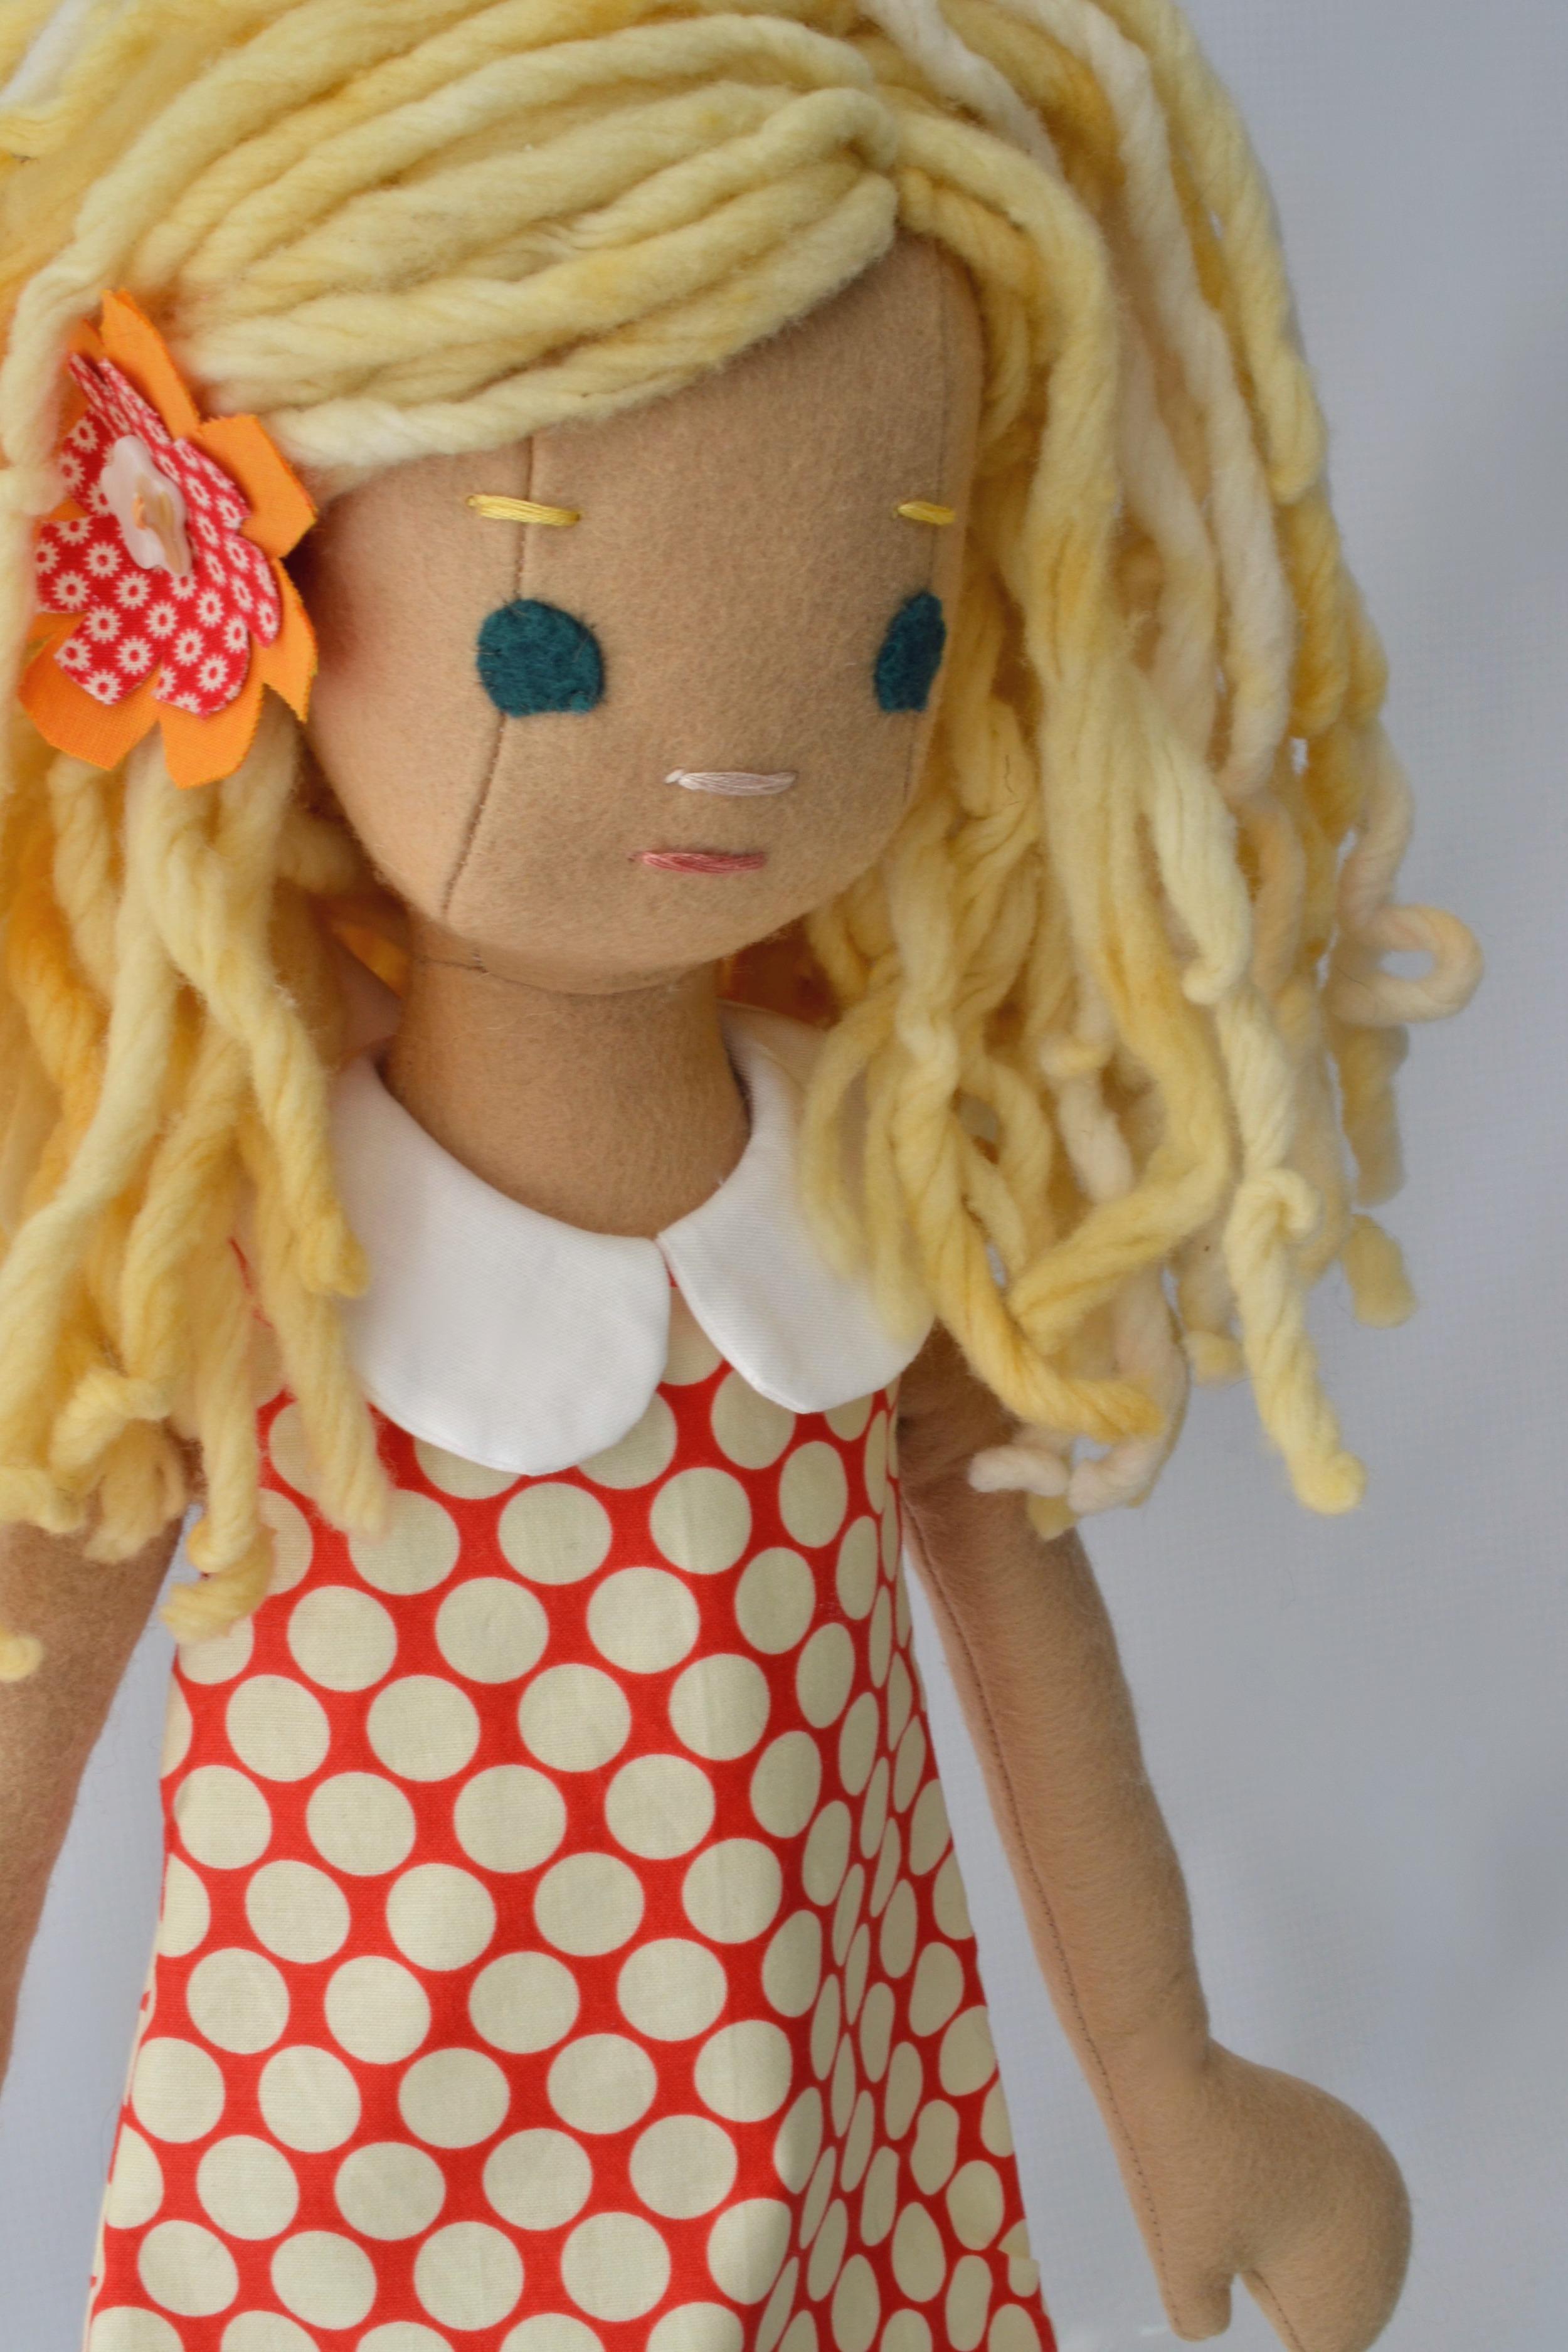 Blond Curly Hair Phoebe  34PM.jpg